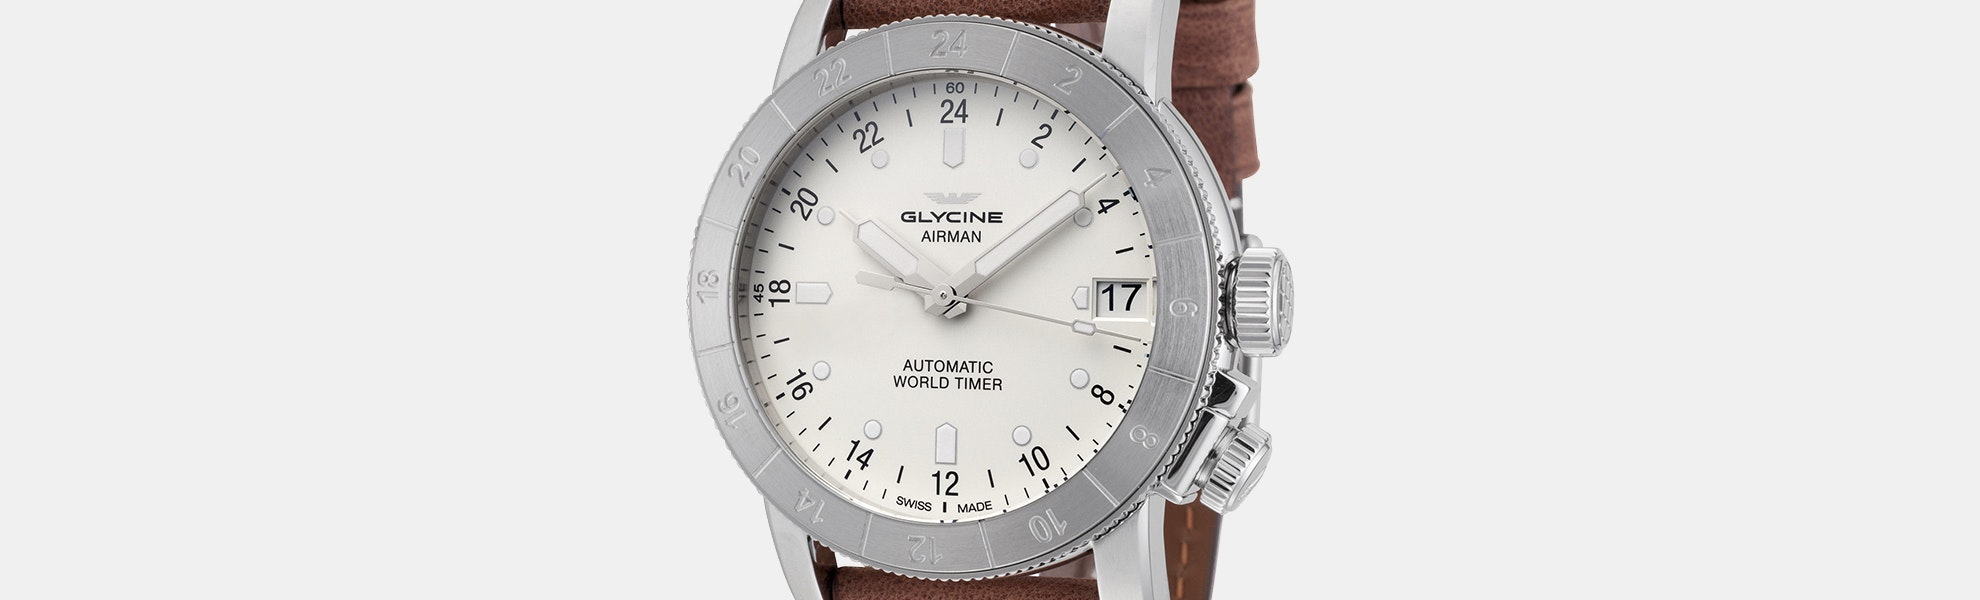 Glycine Airman Purist Automatic Watch